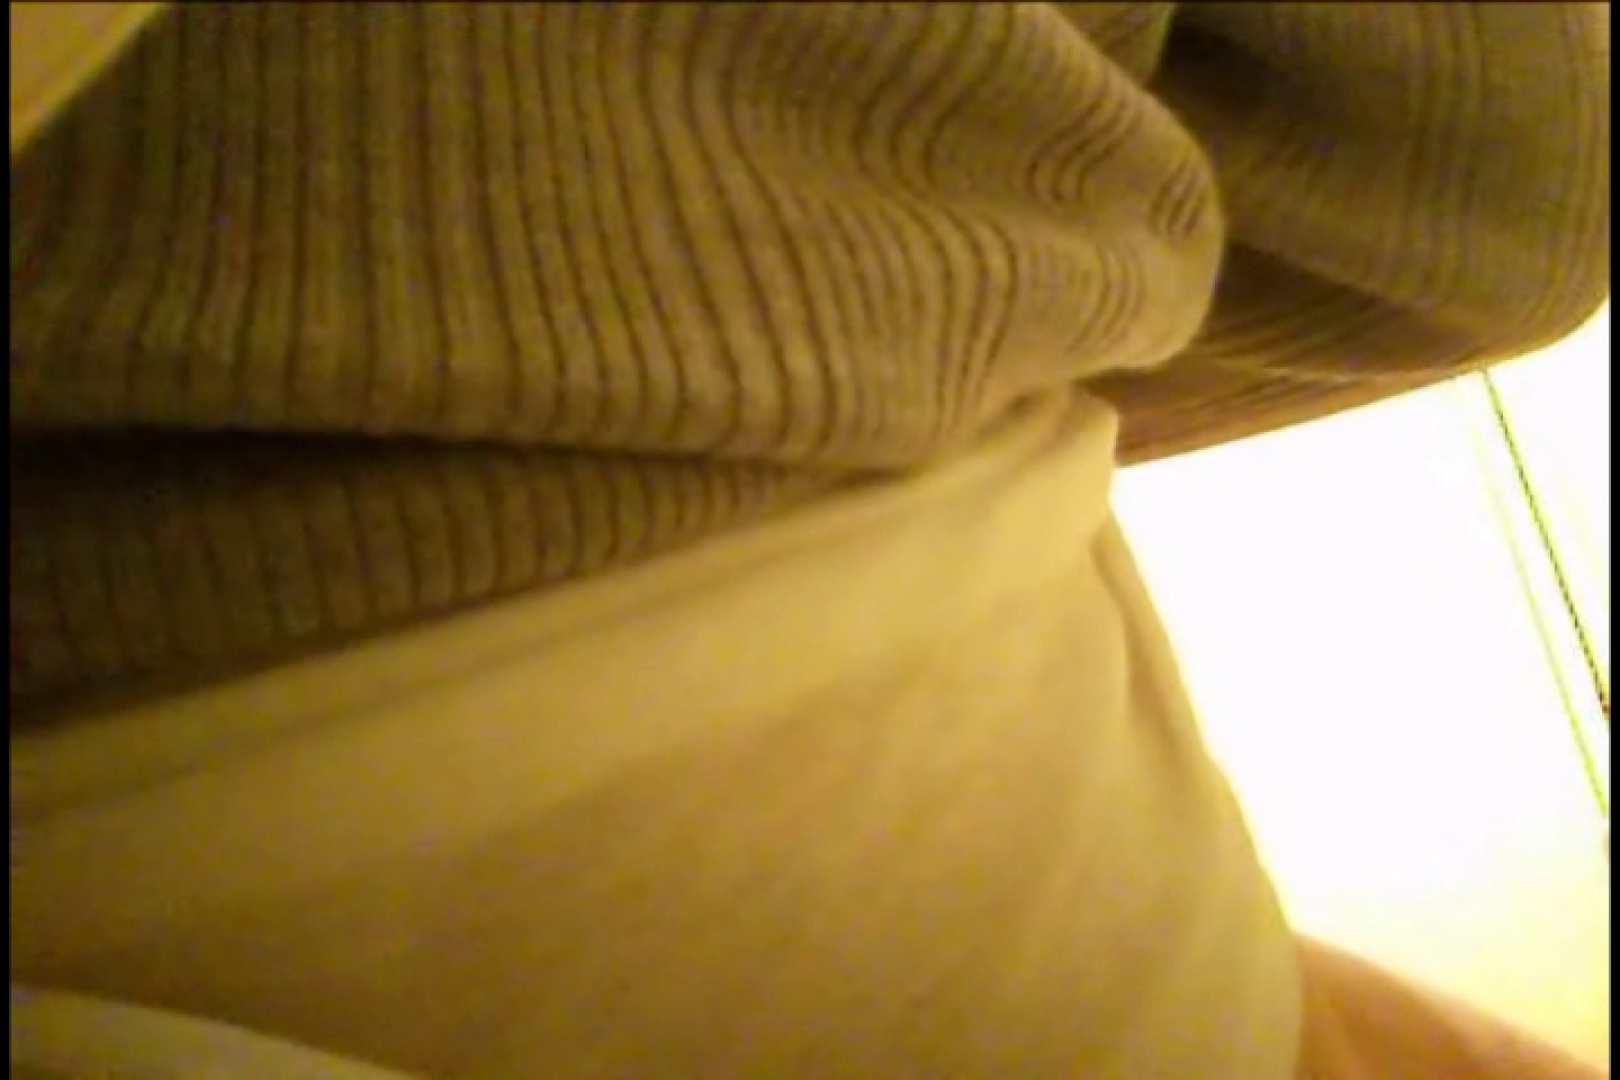 Gボーイ初投稿!掴み取りさんの洗面所覗き!in新幹線!VOL.02 スーツ ちんこ画像 48連発 19